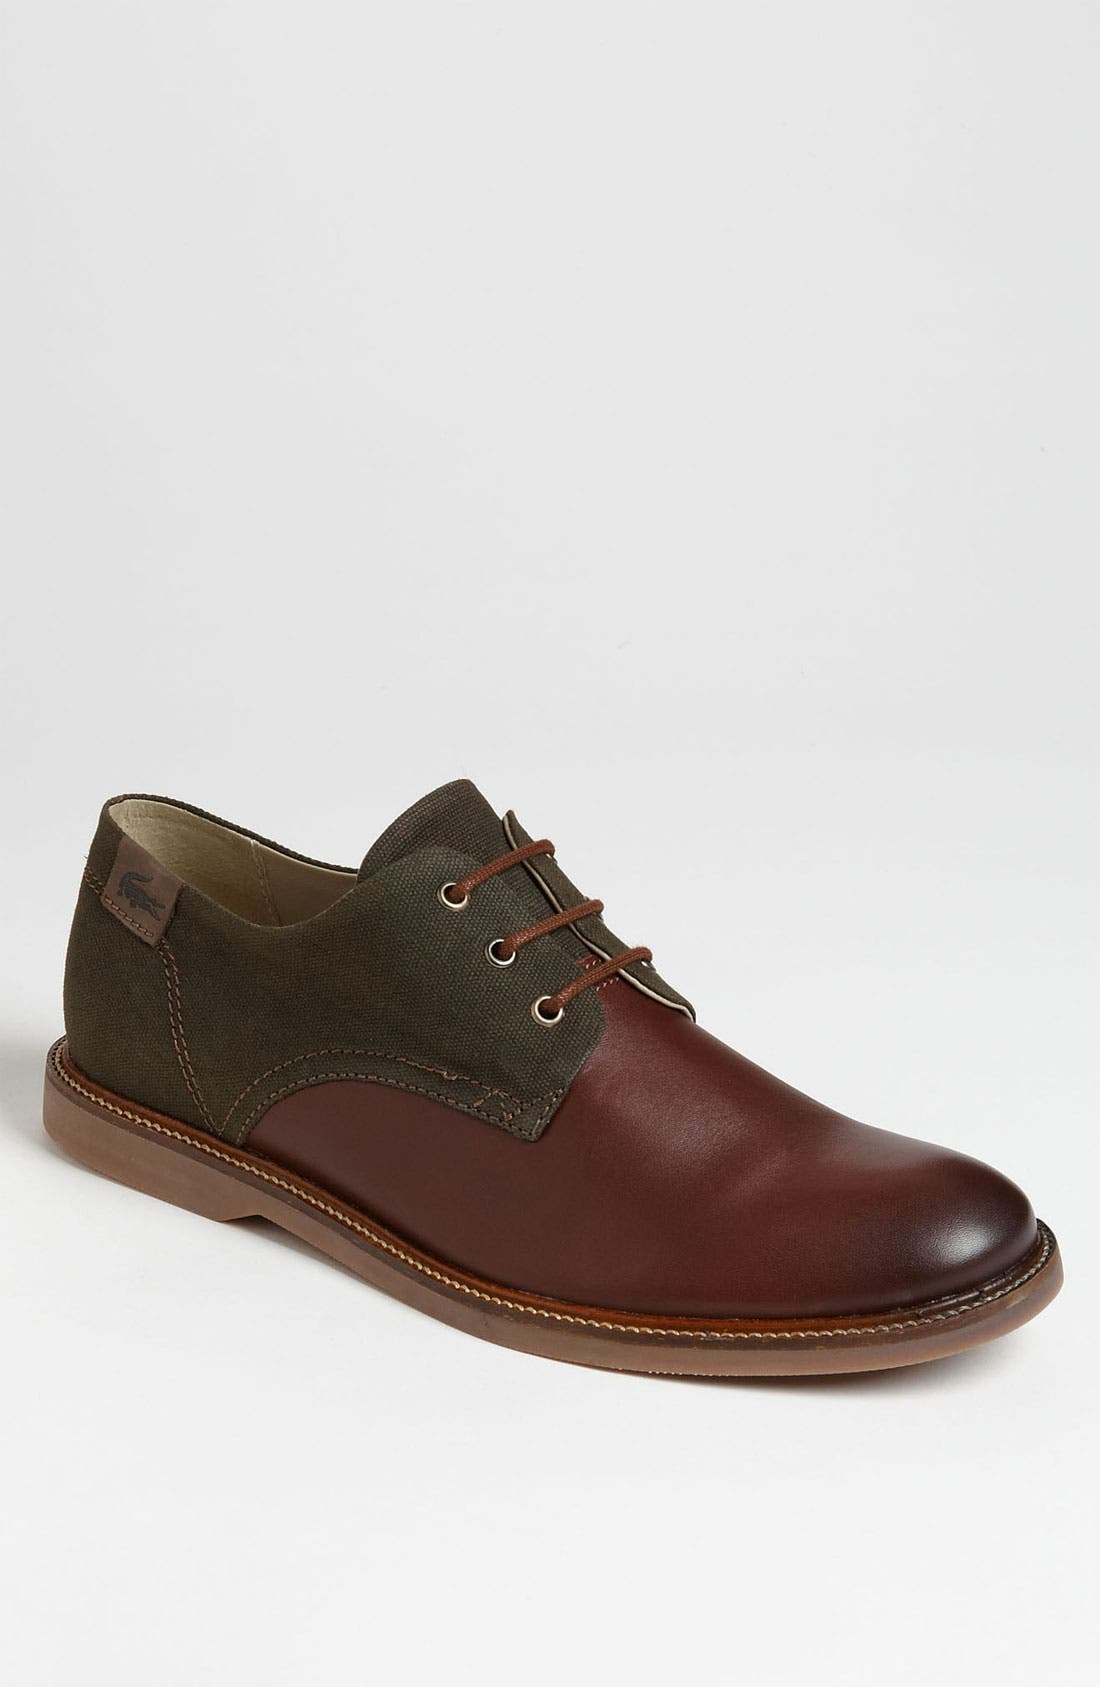 Alternate Image 1 Selected - Lacoste 'Sherbrooke 5' Buck Shoe